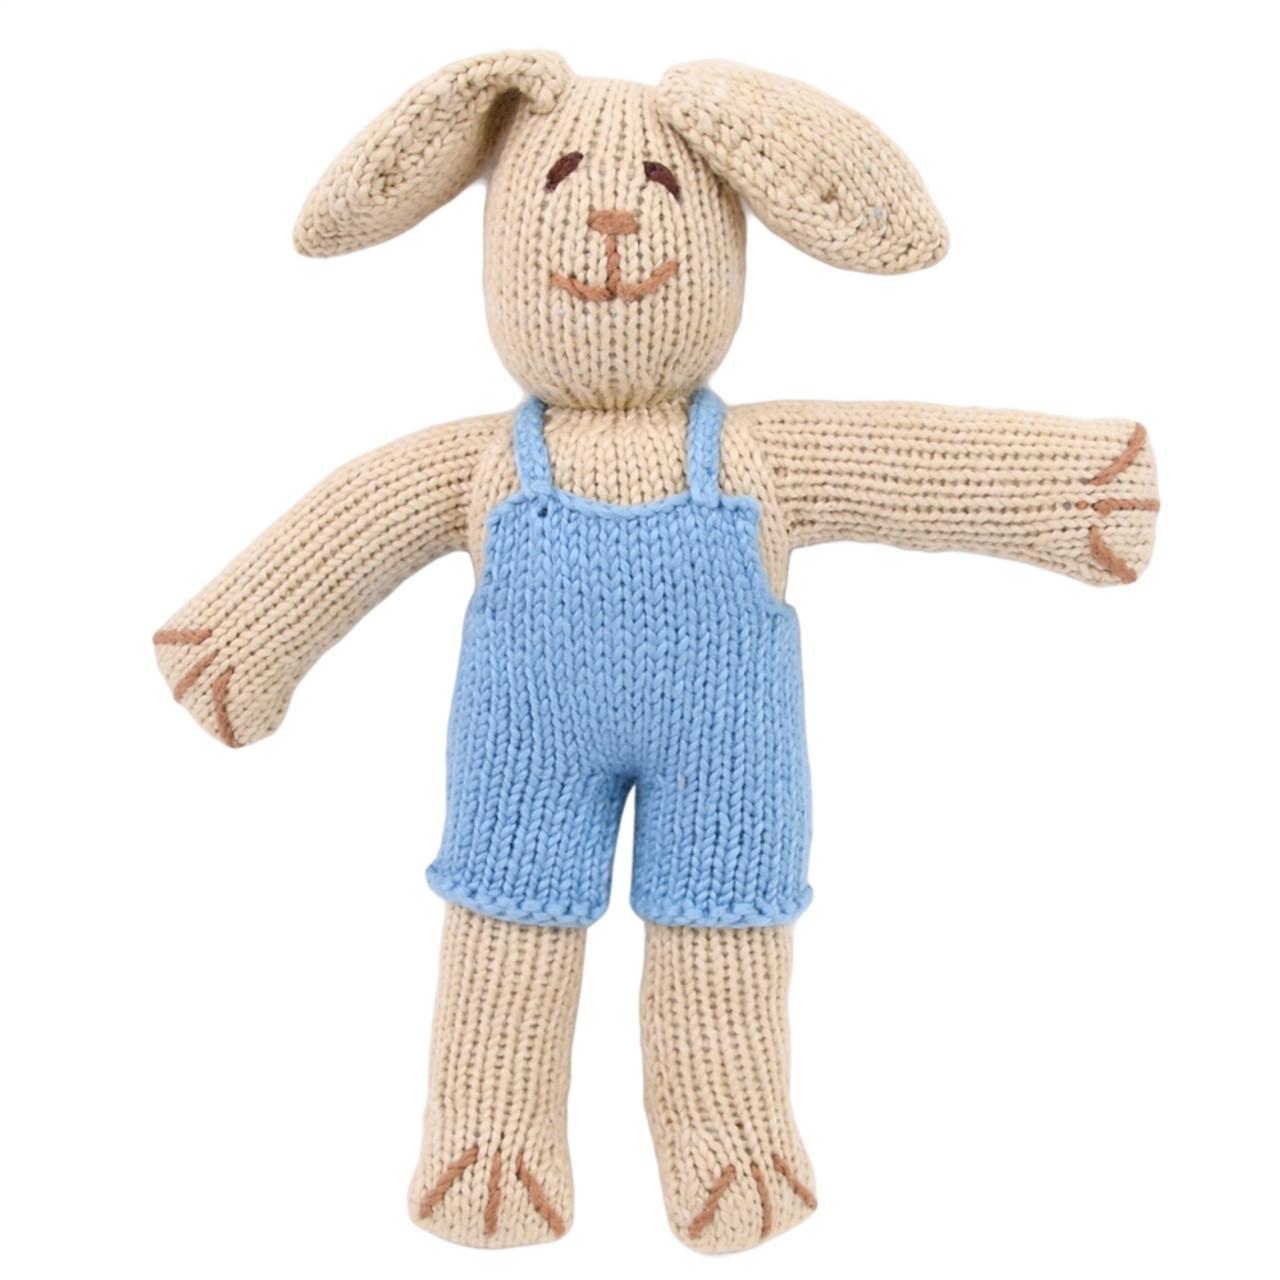 Organic Stuffed Bunny - Thistle Rabbit